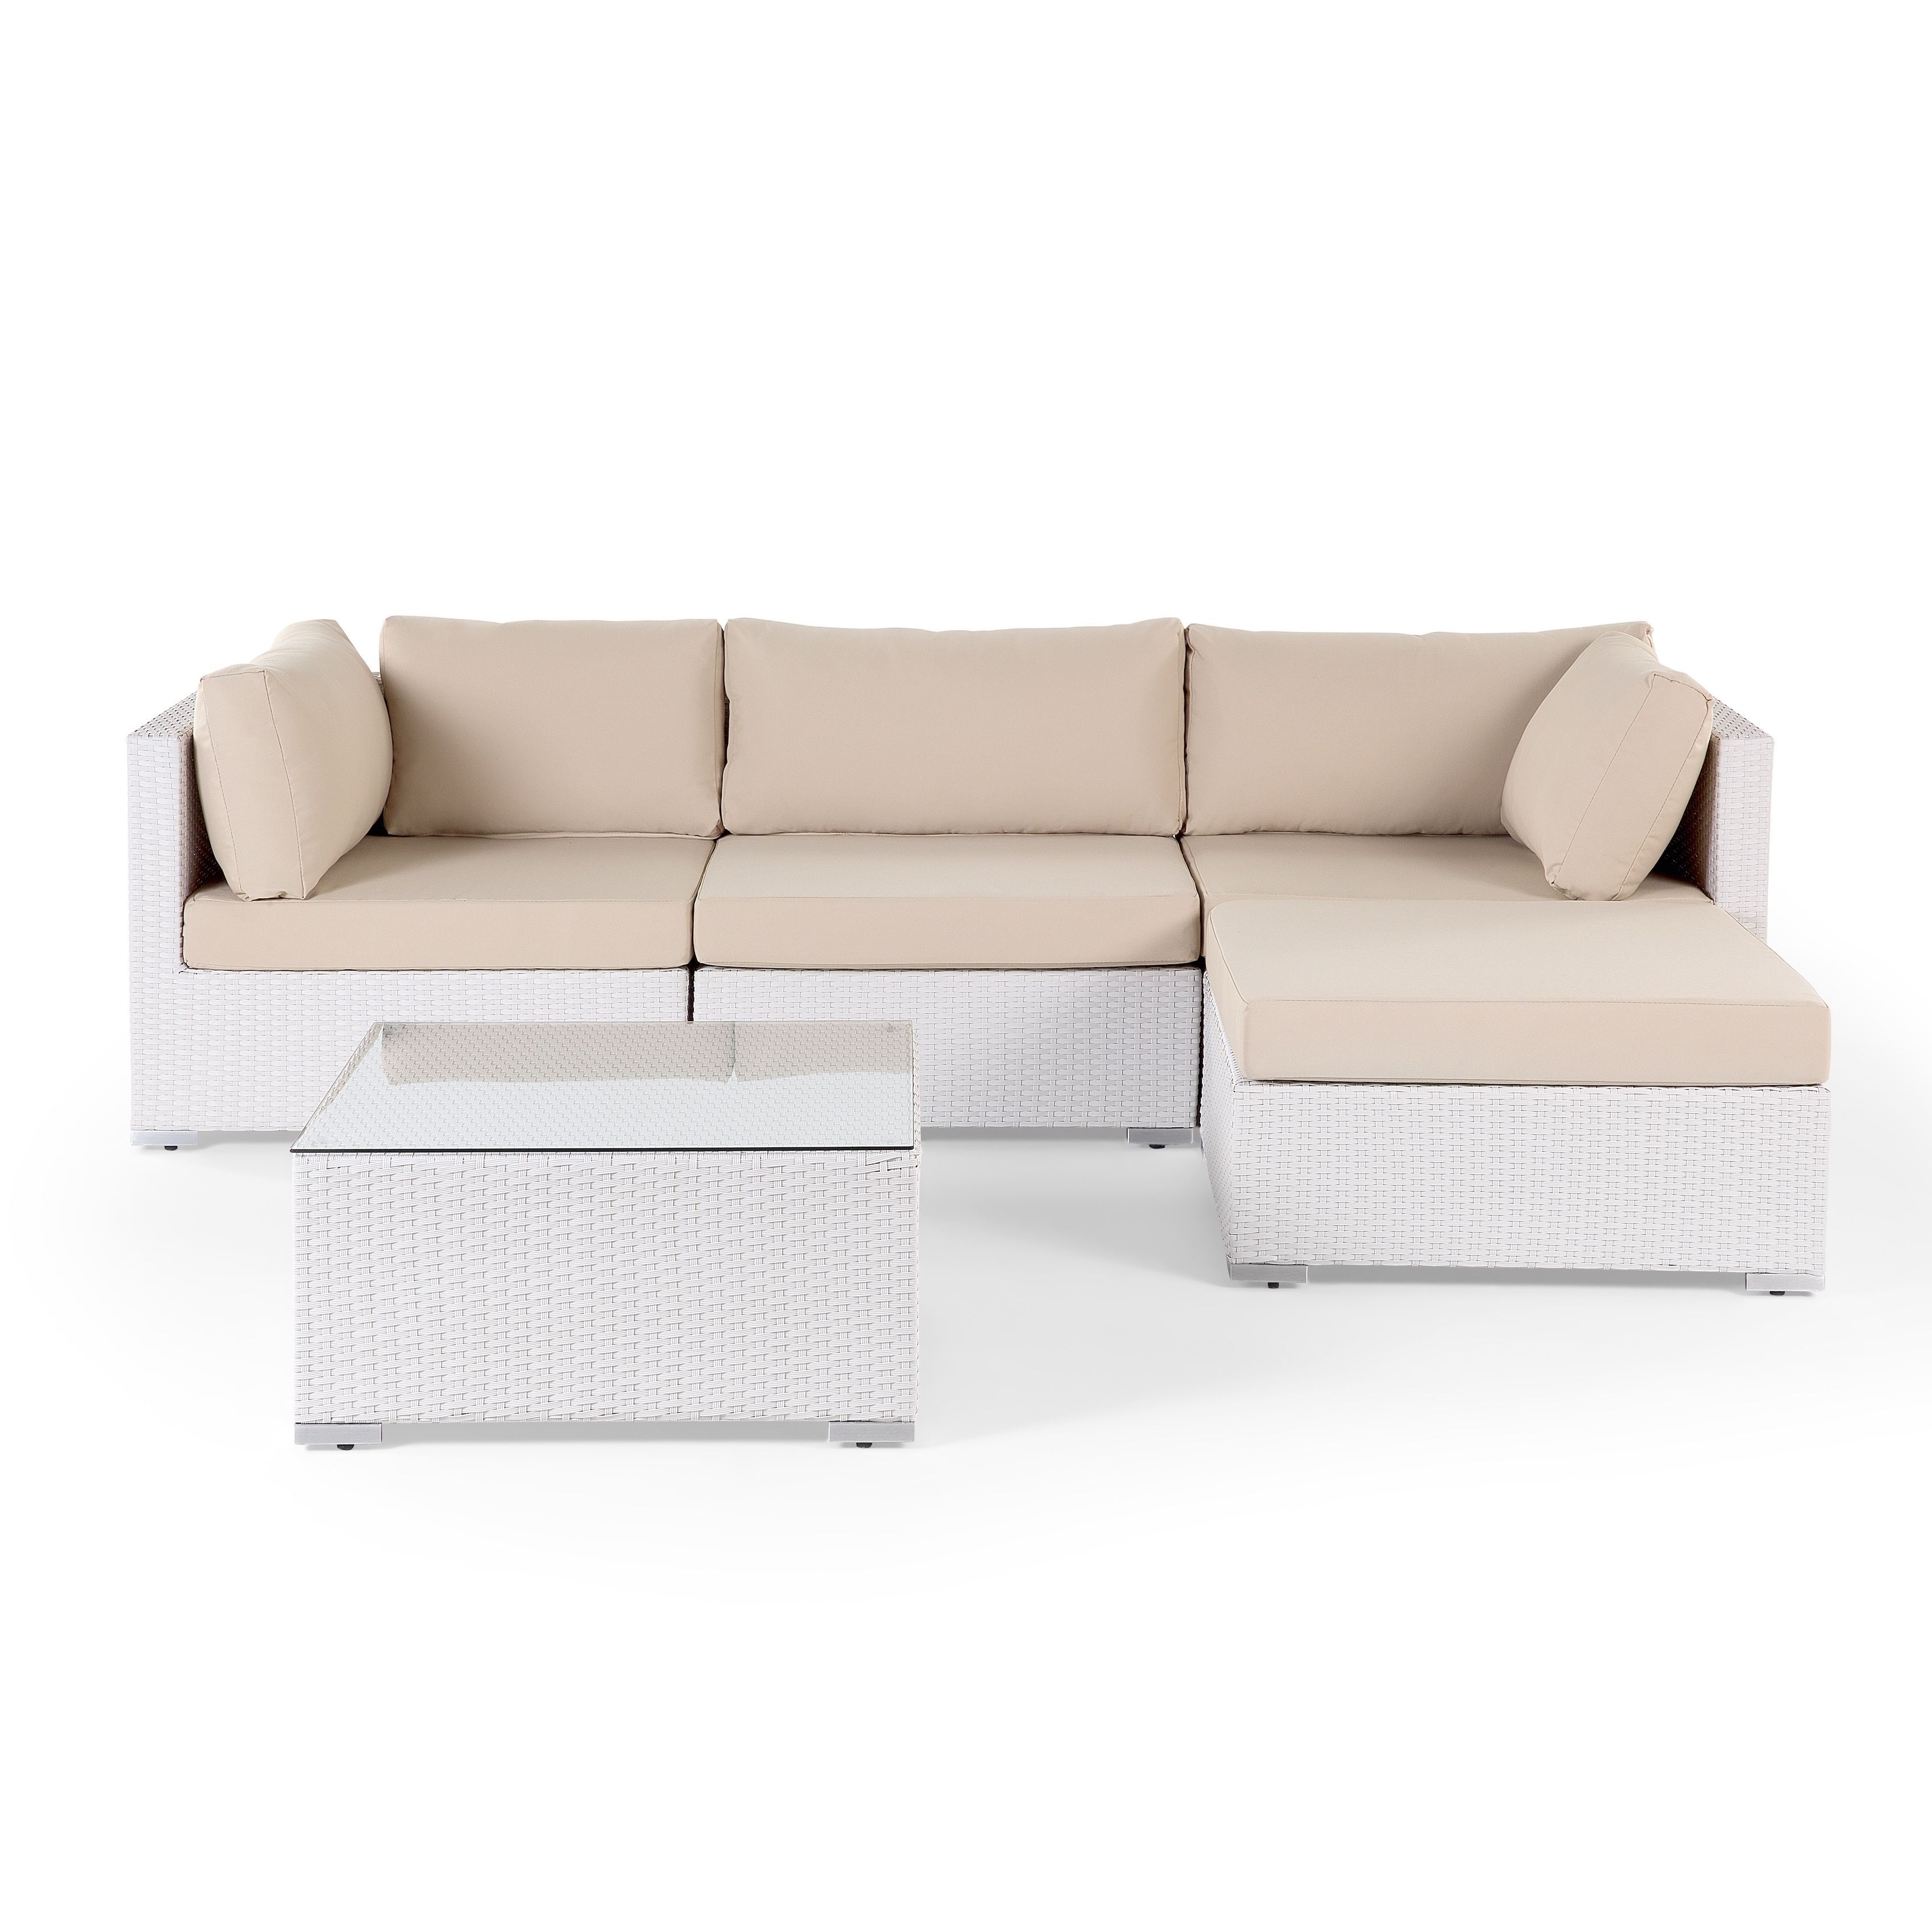 Sano Modern White Wicker Outdoor Sectional Sofa Set by Velago